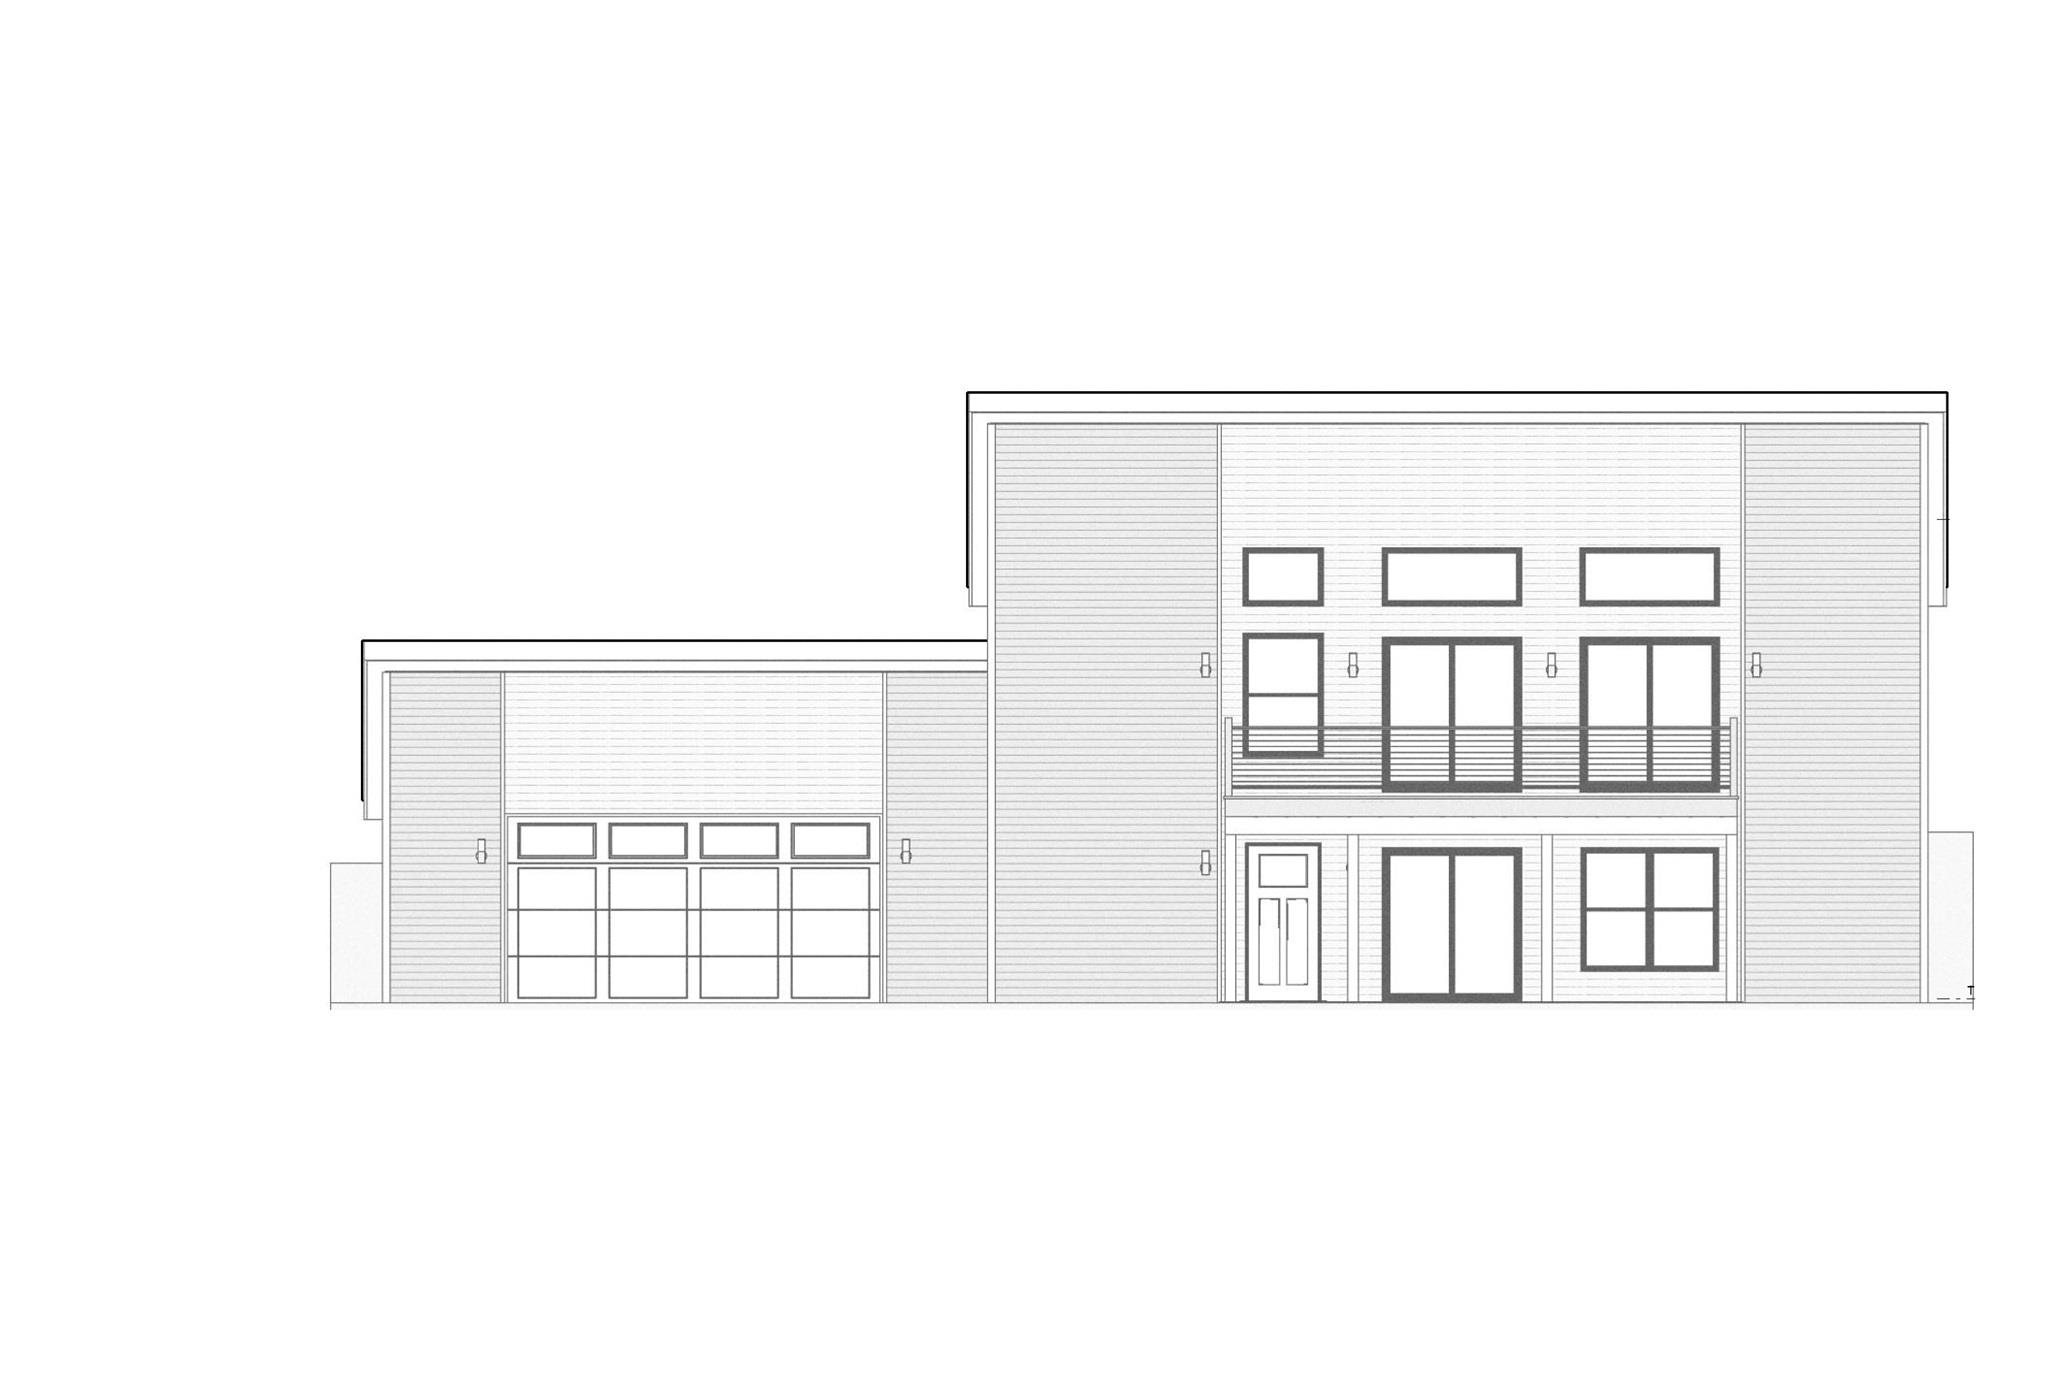 Lot 3 WAVERLY Property Photo - Davenport, IA real estate listing